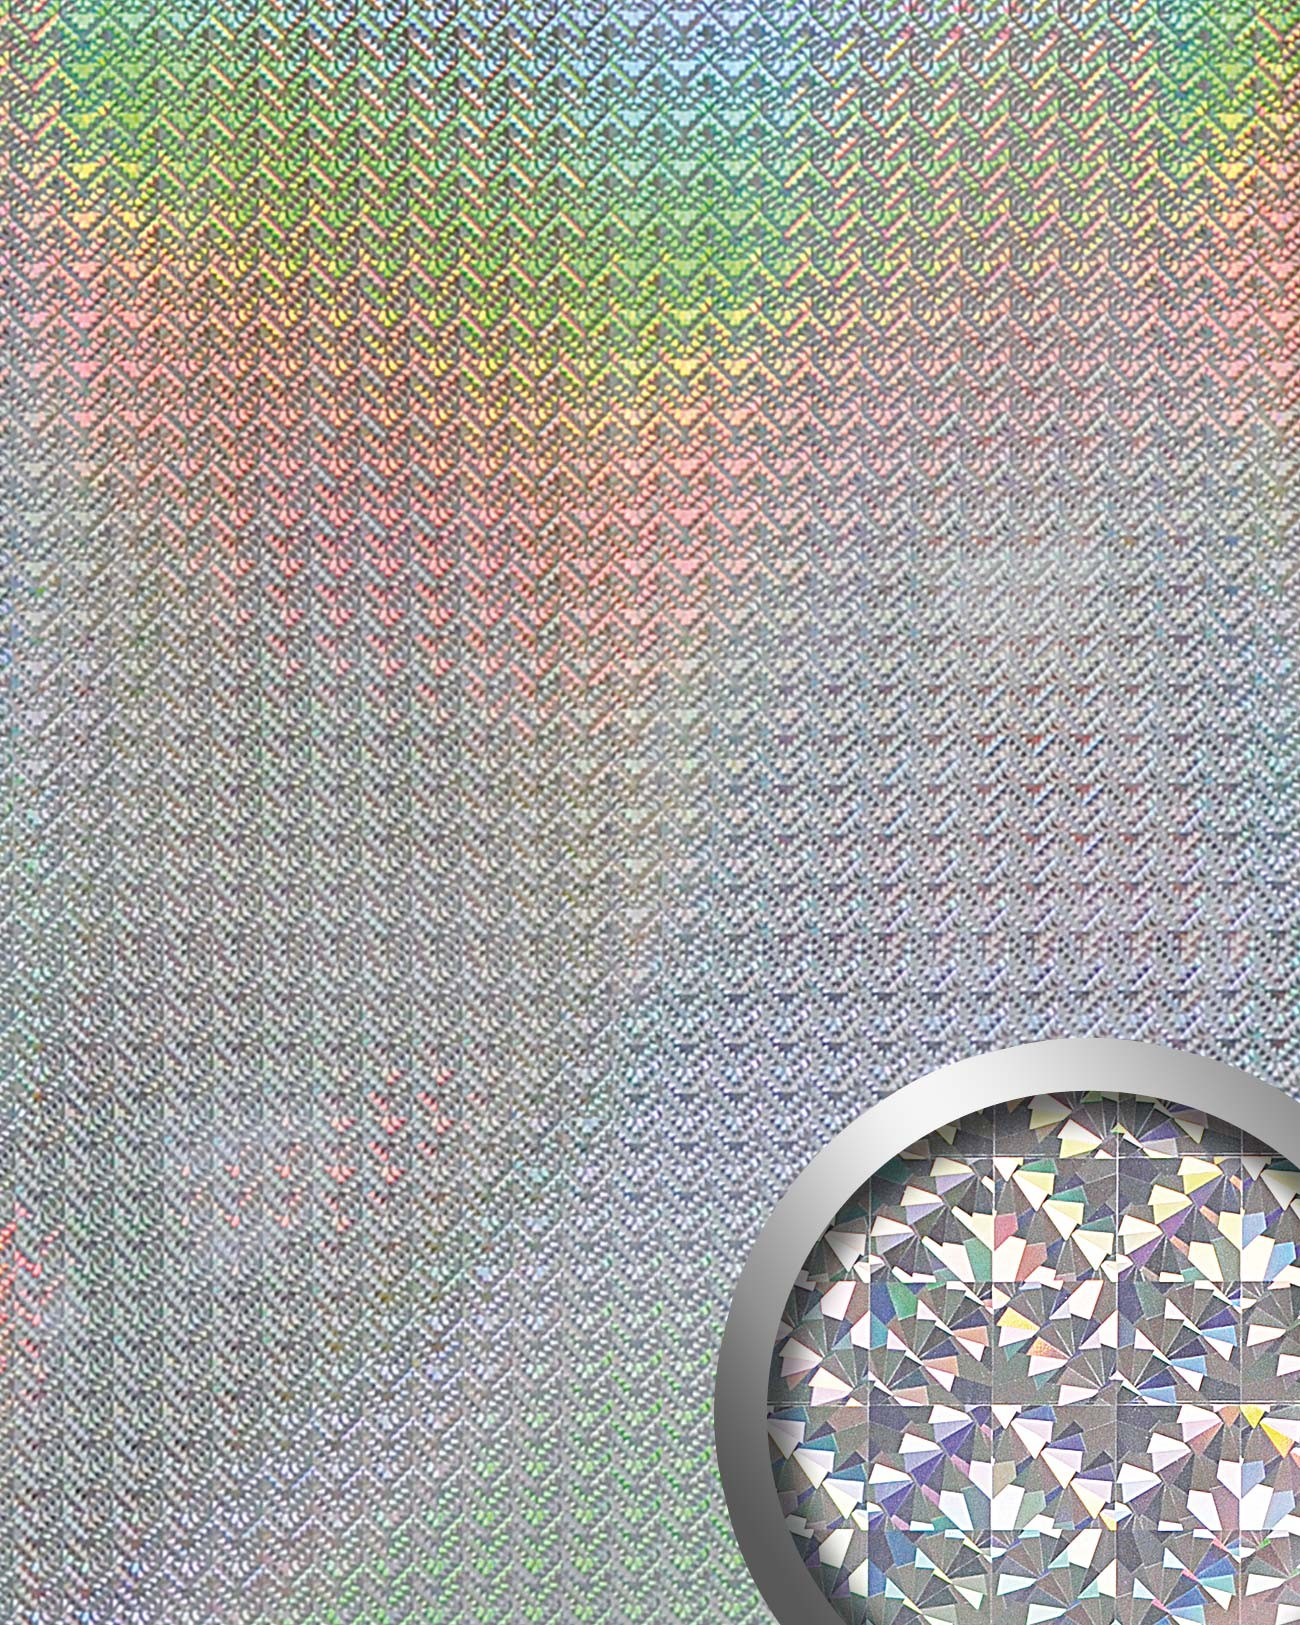 wallface 10175 deco galaxy wandpaneel metall dekor mosaik. Black Bedroom Furniture Sets. Home Design Ideas